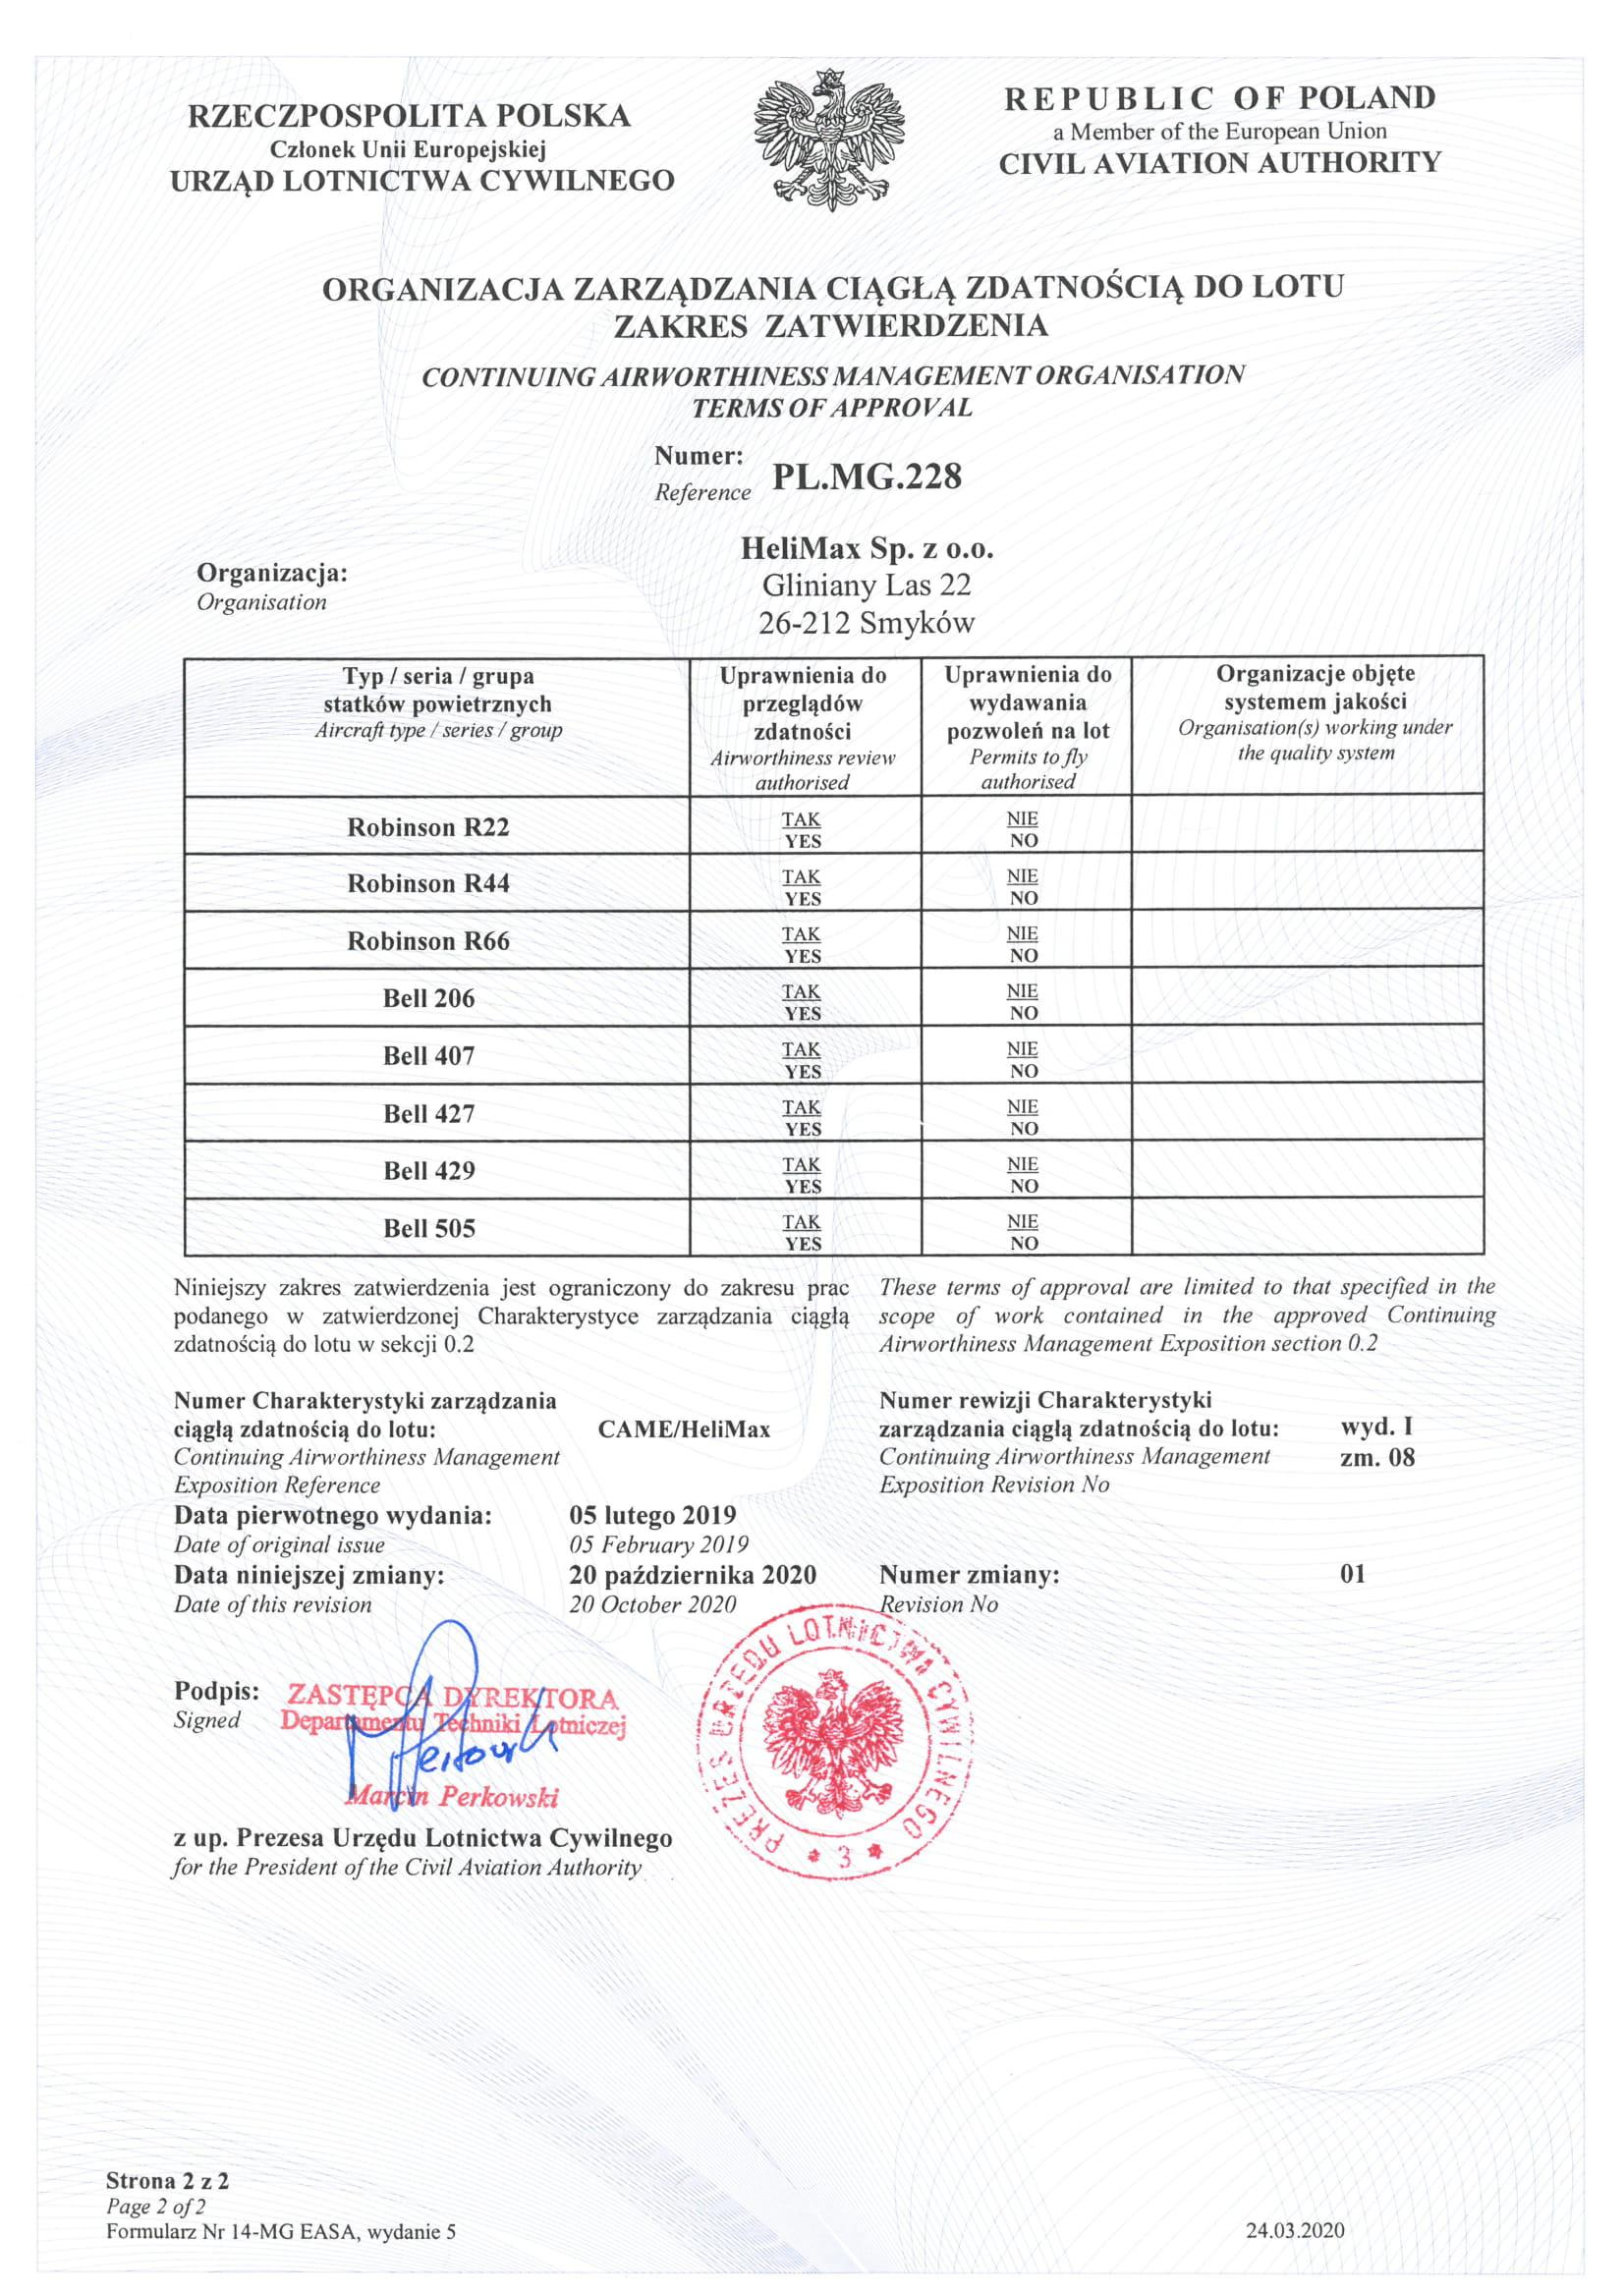 CAMO_certyfikat-2